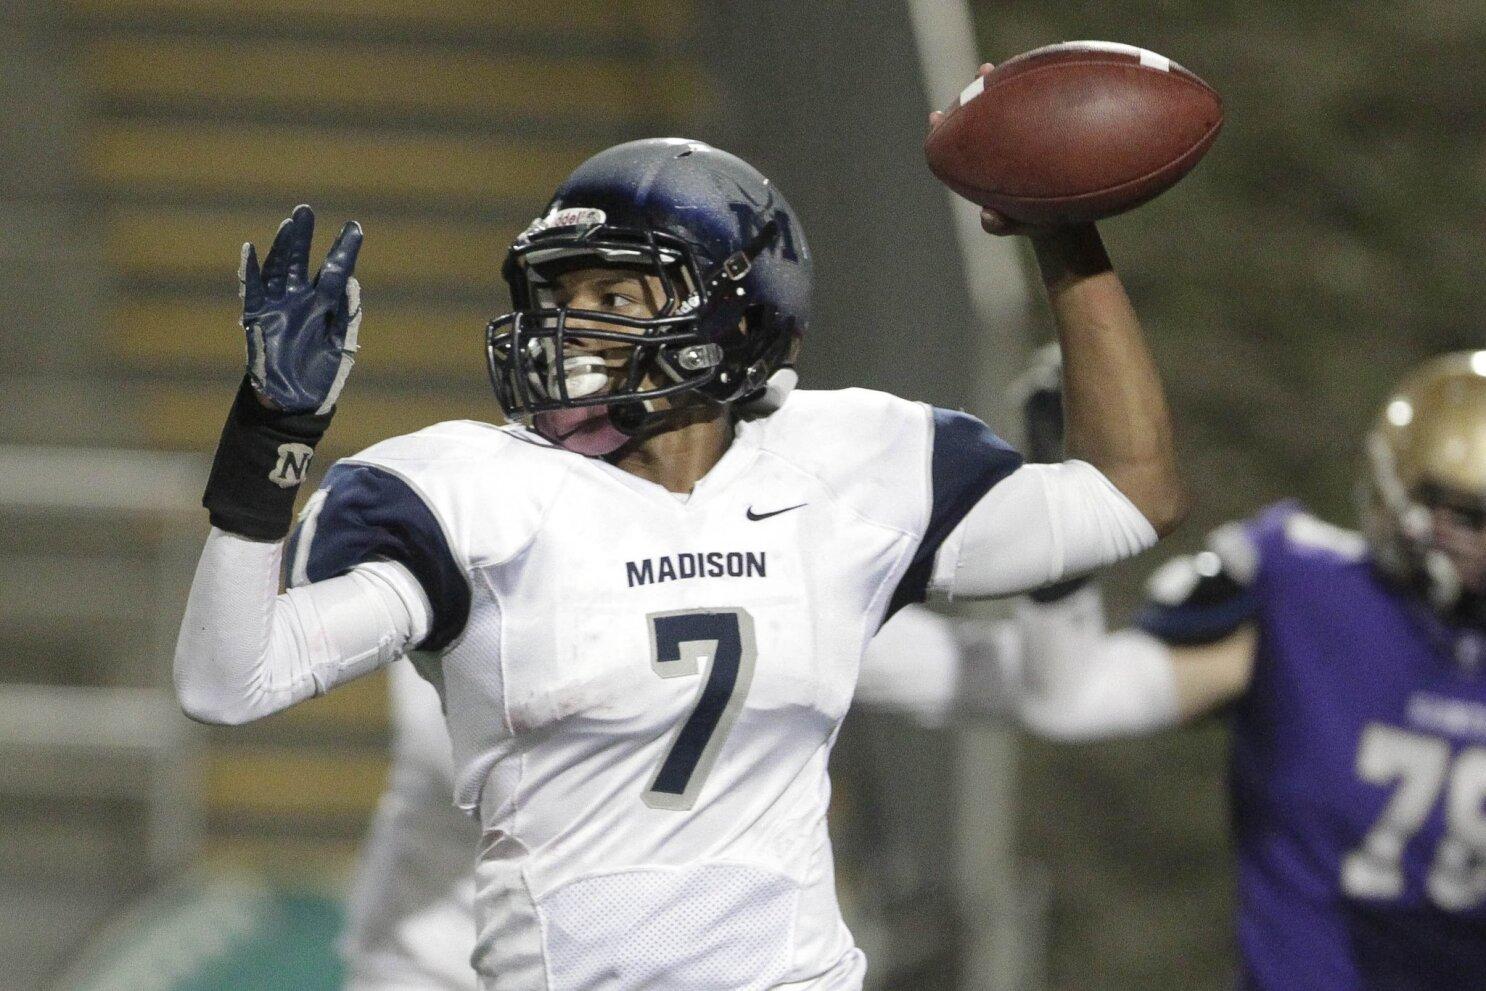 2014 All-Academic Team: football - The San Diego Union-Tribune